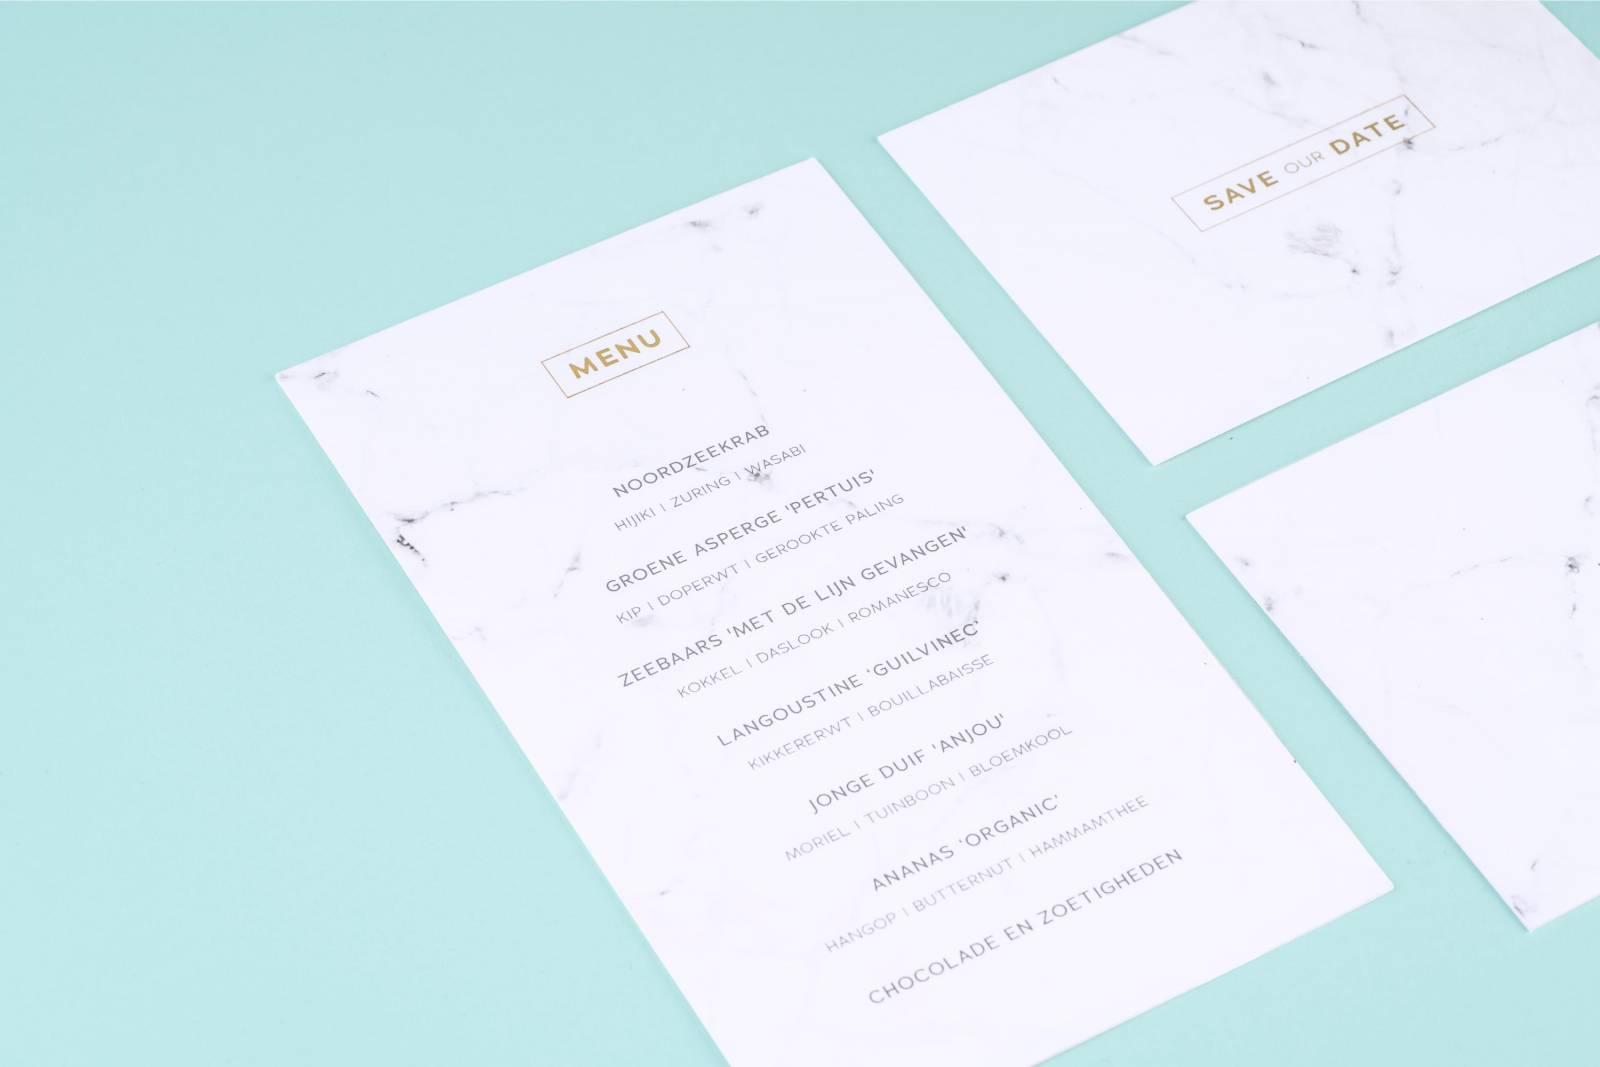 House of Weddings Uitgelijnd Drukwerk Uitnodiging Wedding Stationary Huwelijk Letterpress (2) (Custom)